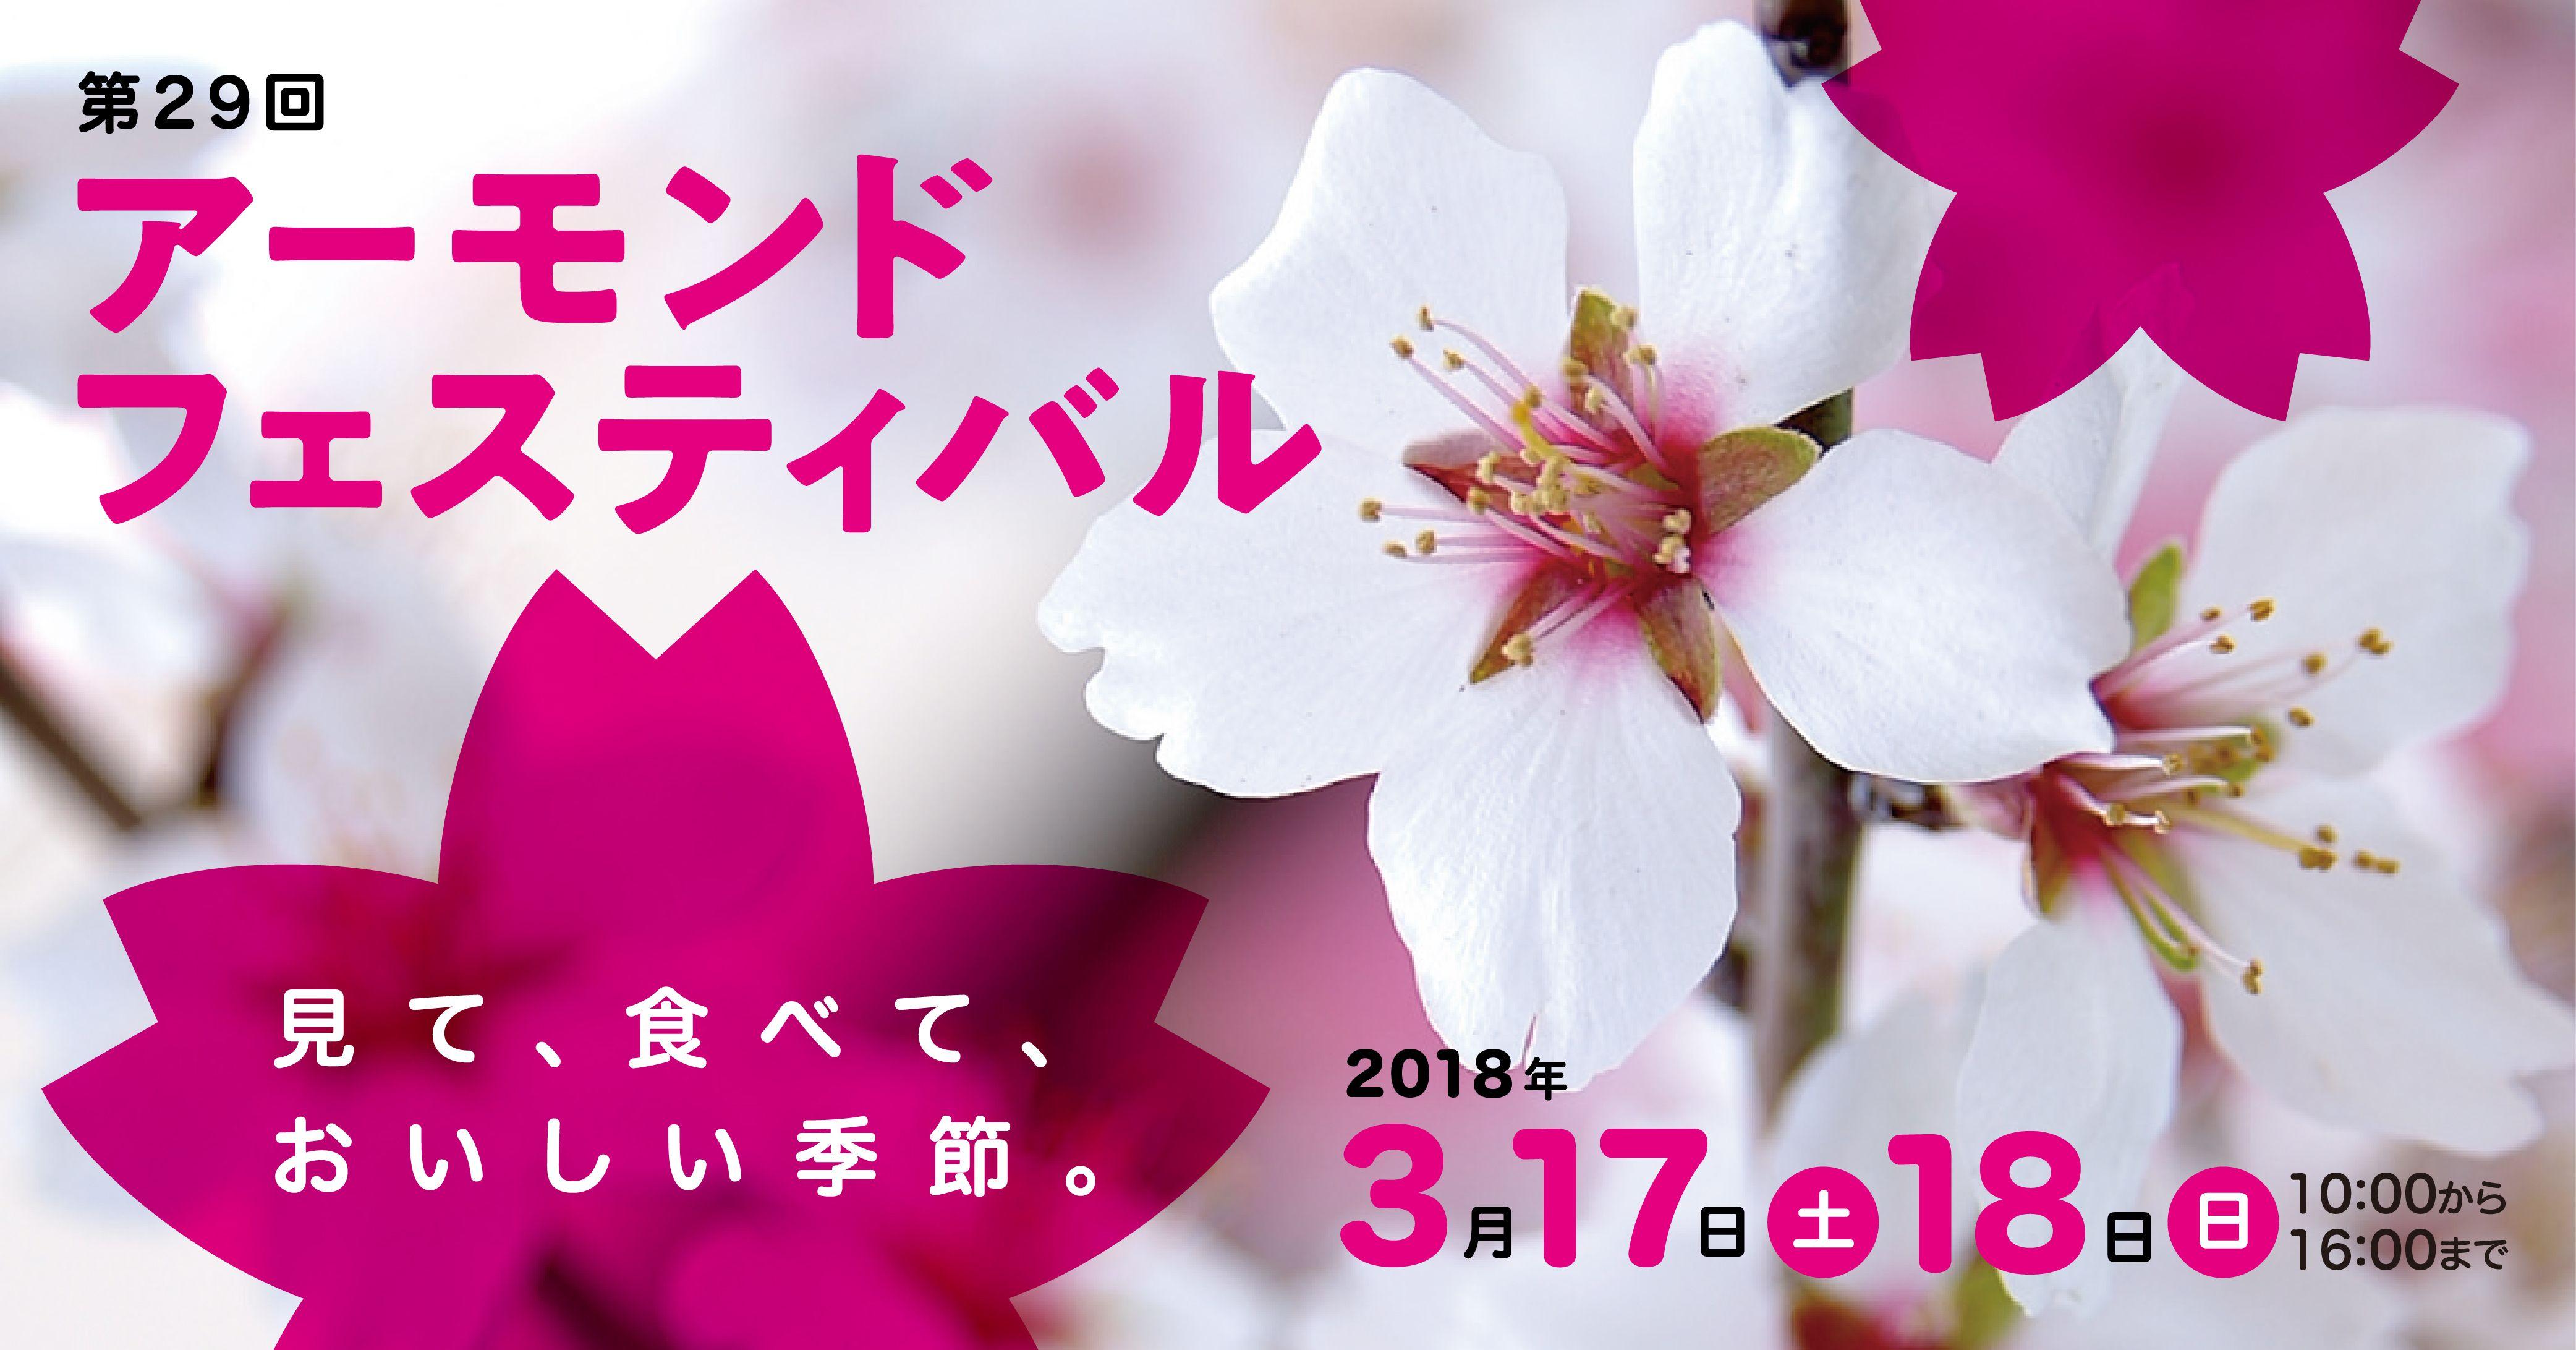 http://www.toyonut.co.jp/news/upload/_toyonuts_AF_fb_180126-01.jpg